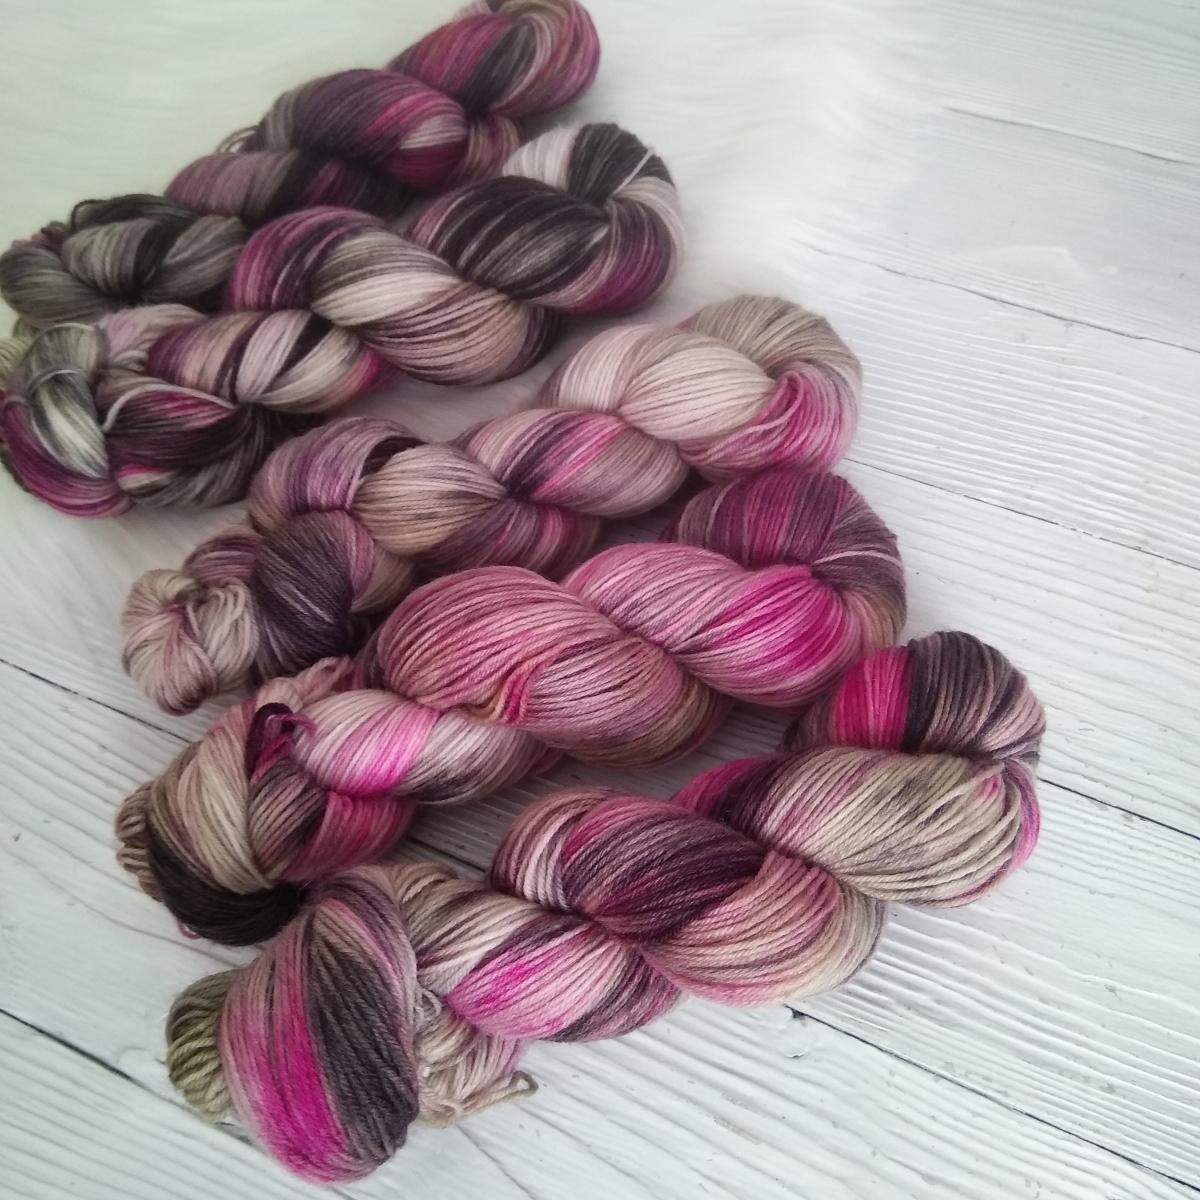 woodico.pro hand dyed yarn 037 6 1200x1200 - Hand dyed yarn / 037